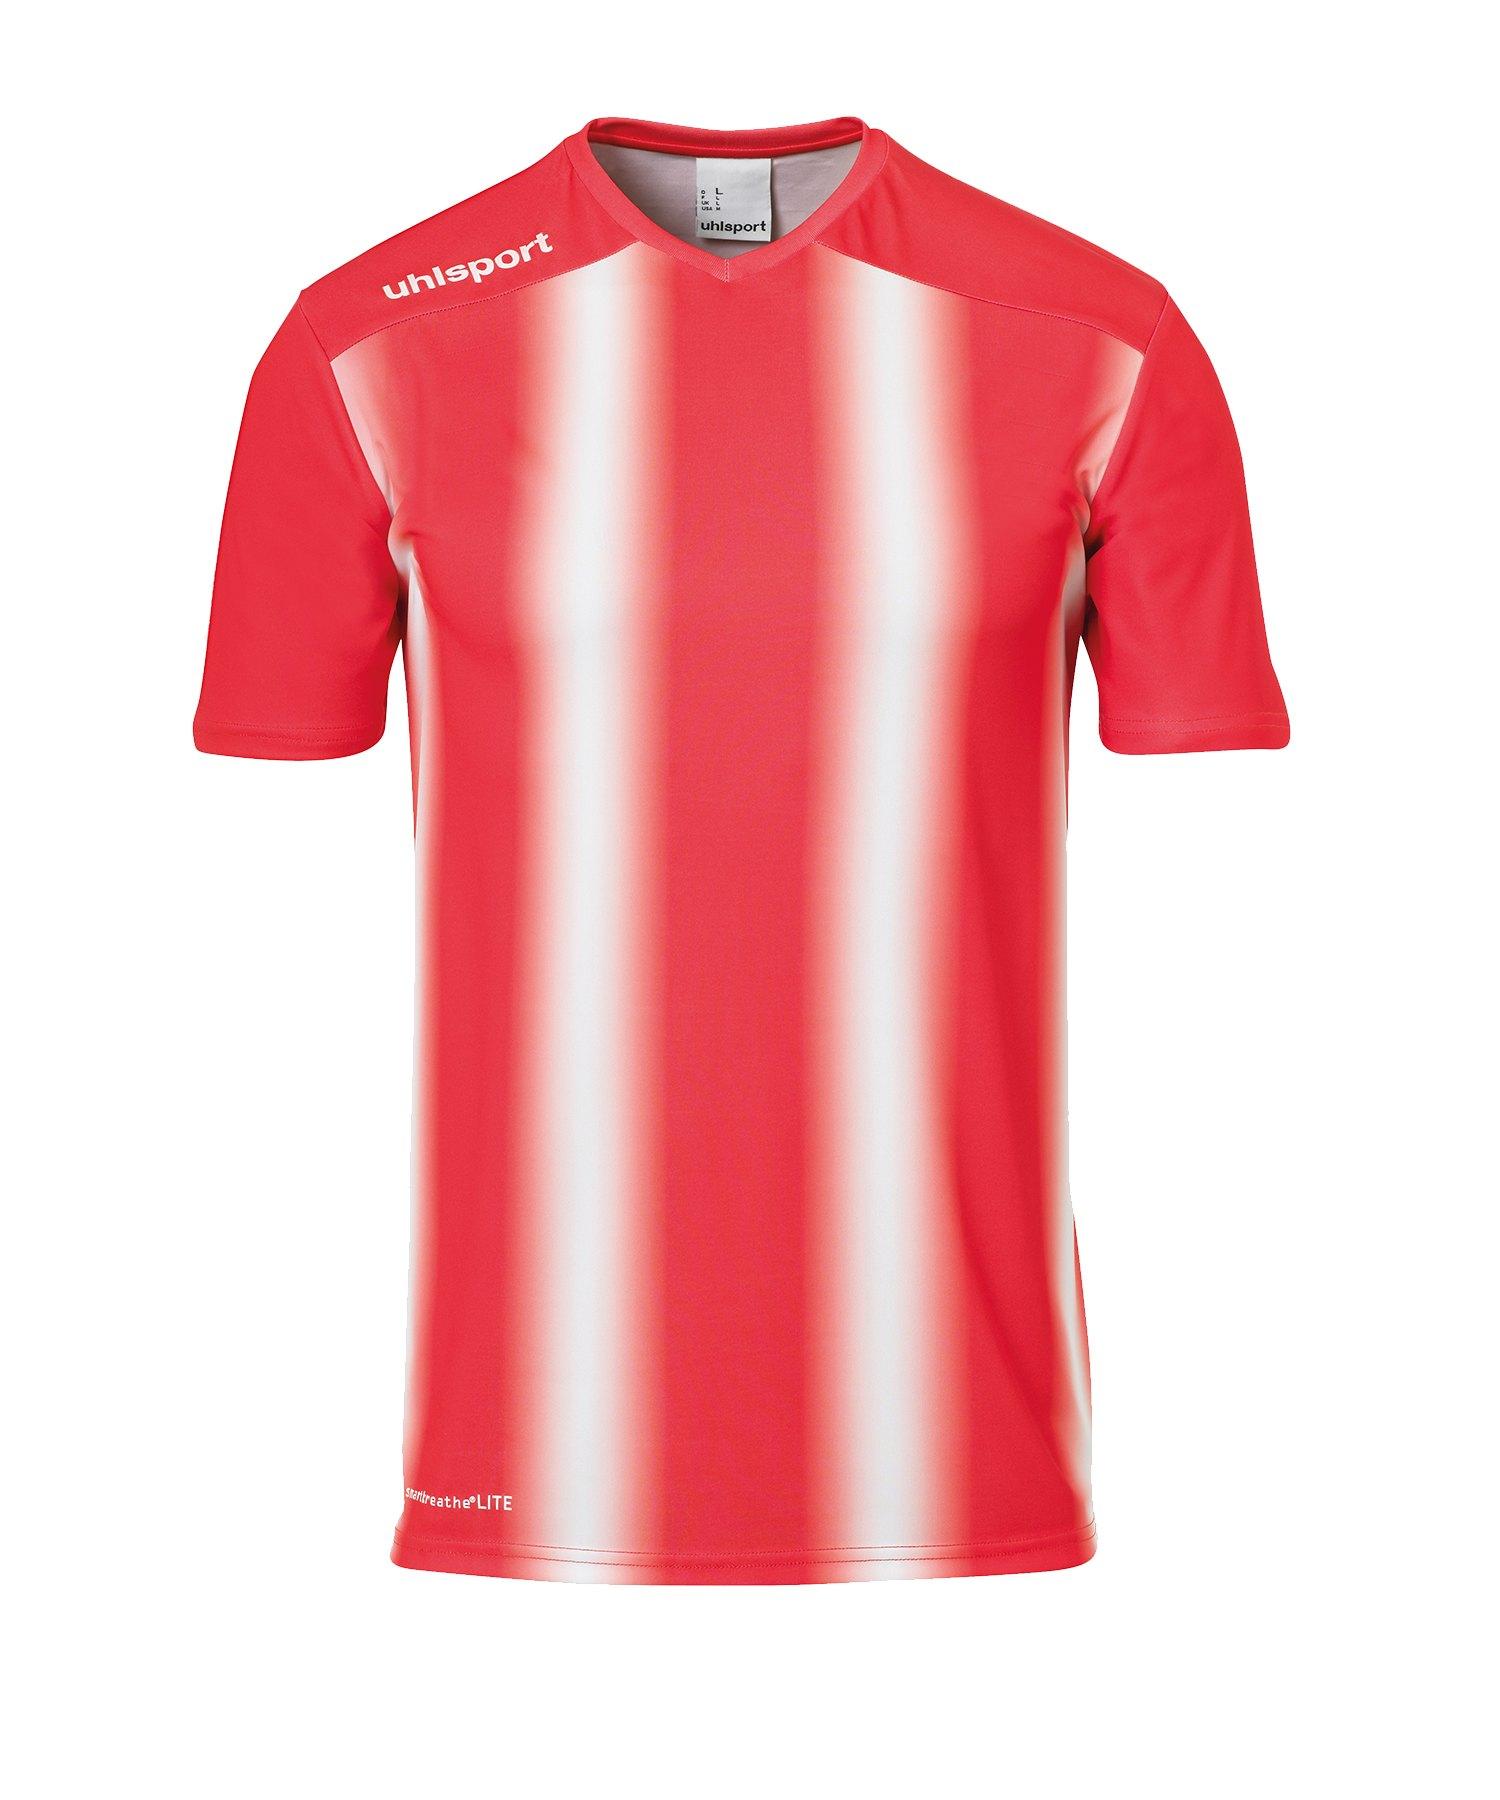 Uhlsport Stripe 2.0 Trikot kurzarm Rot Weiss F03 - Rot